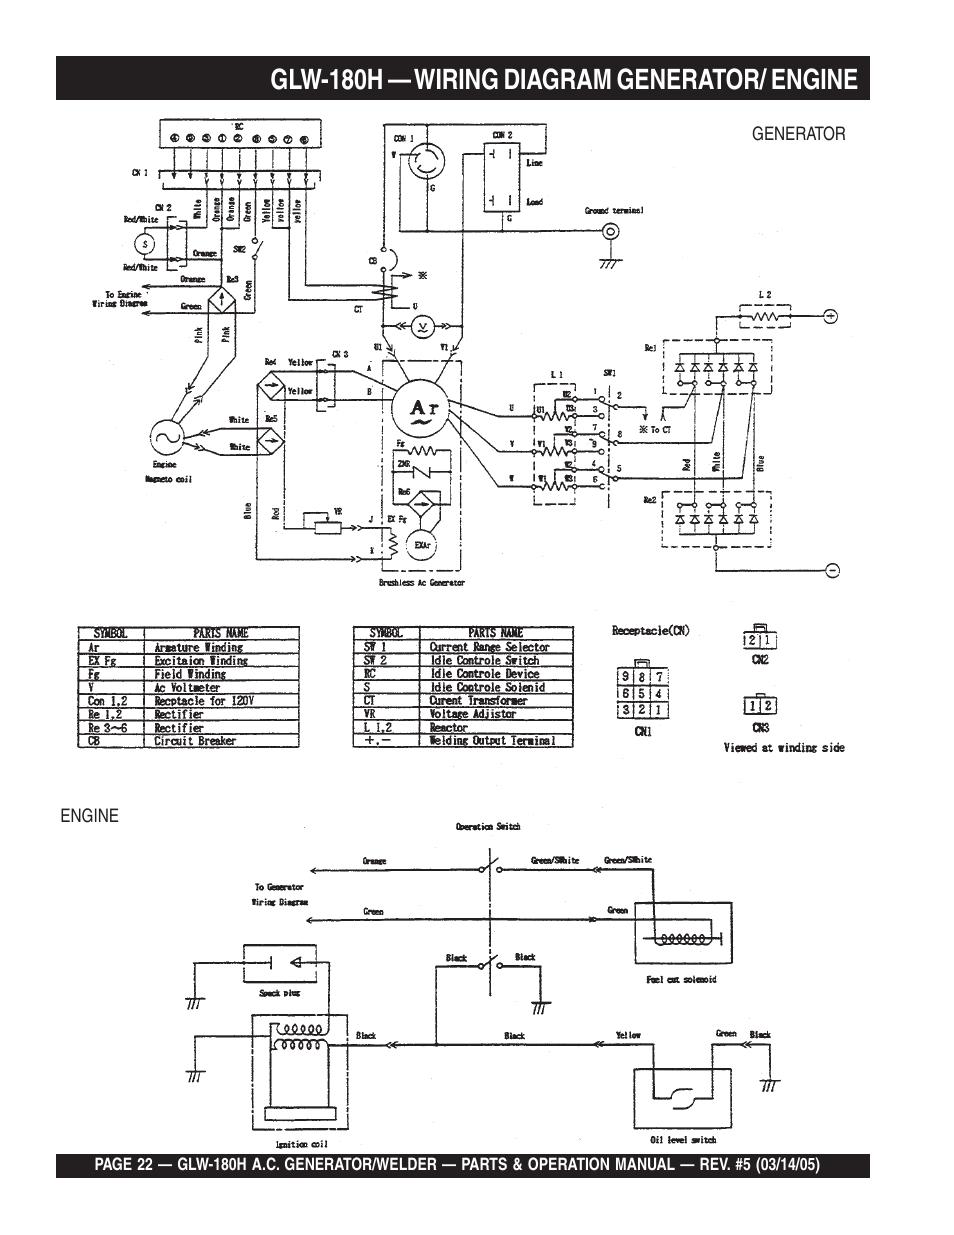 Stamford Ac Generator Wiring Diagram. Diagrams. Auto